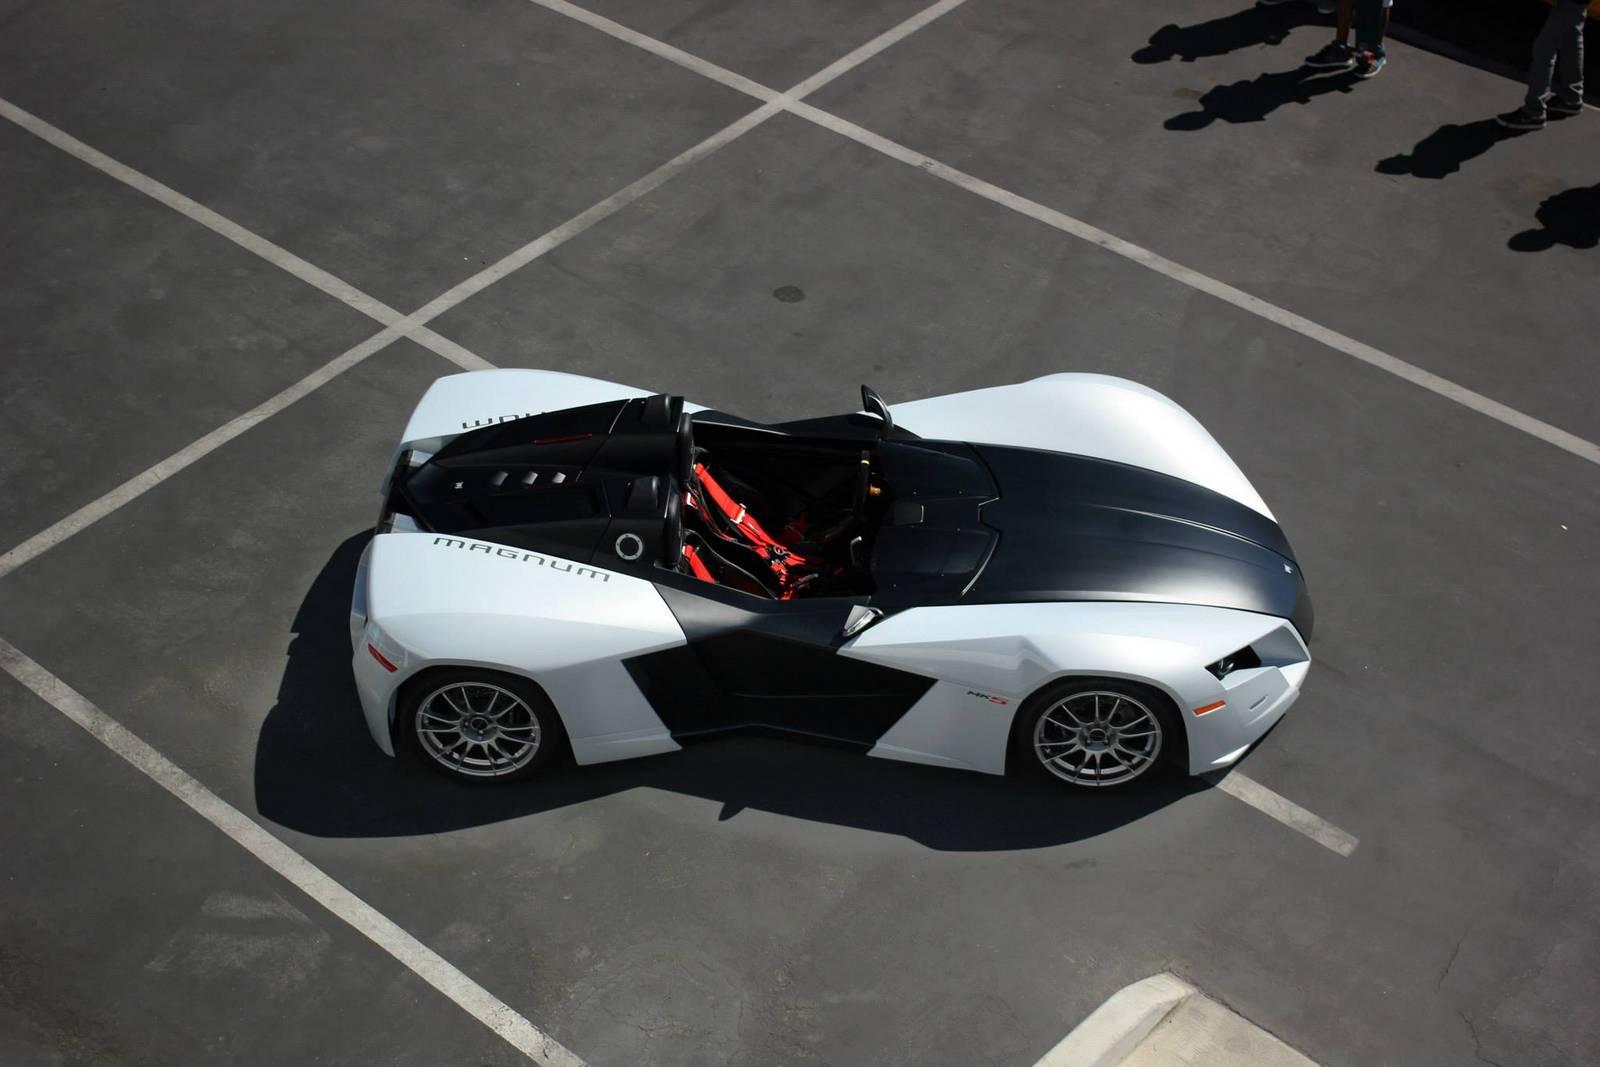 Lamborghini Newport Beach Supercar Show Gtspirit